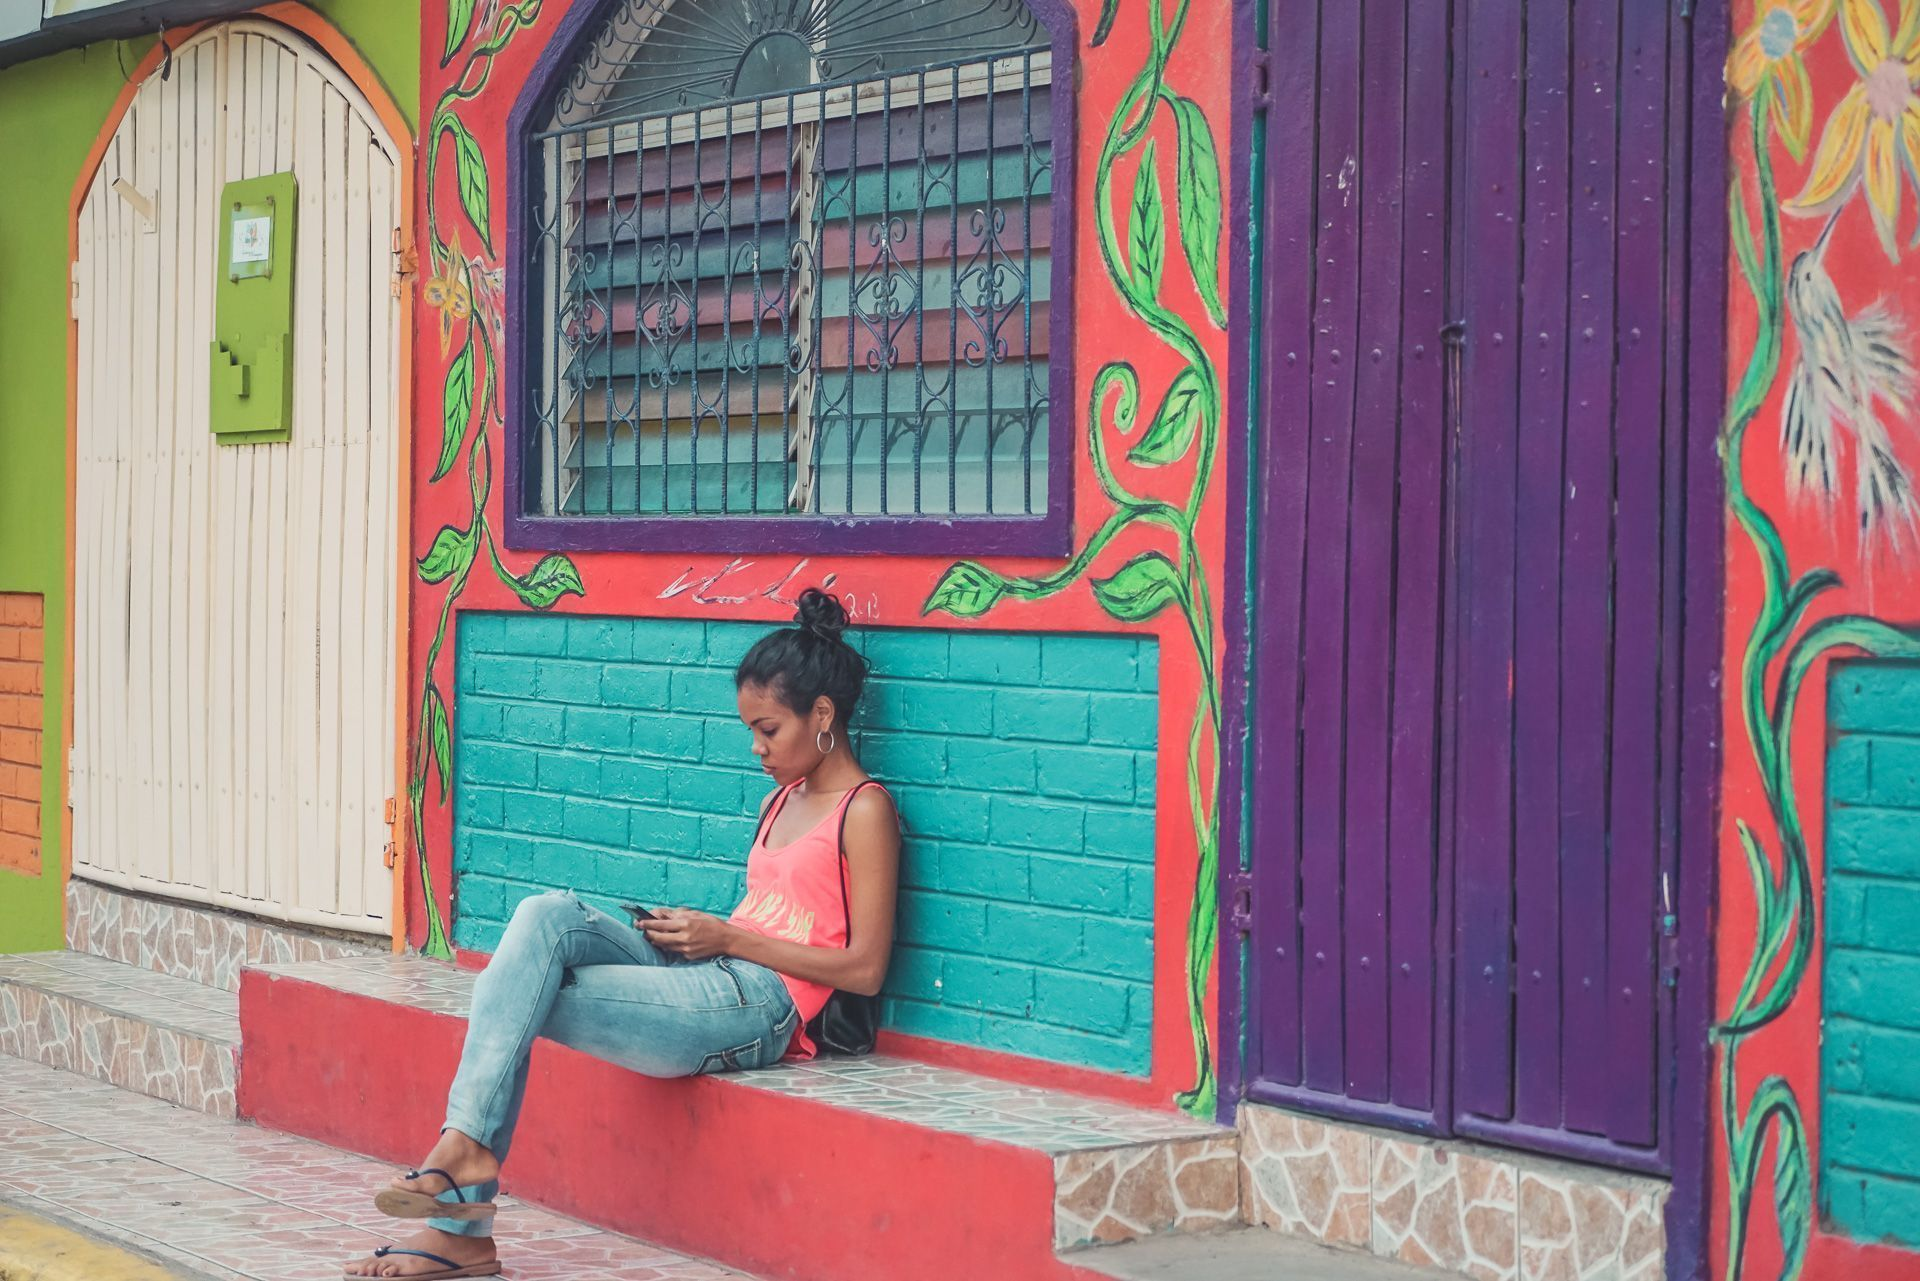 Lesvoyageuses-Nicaragua-Sans-Visa-Marocains-23